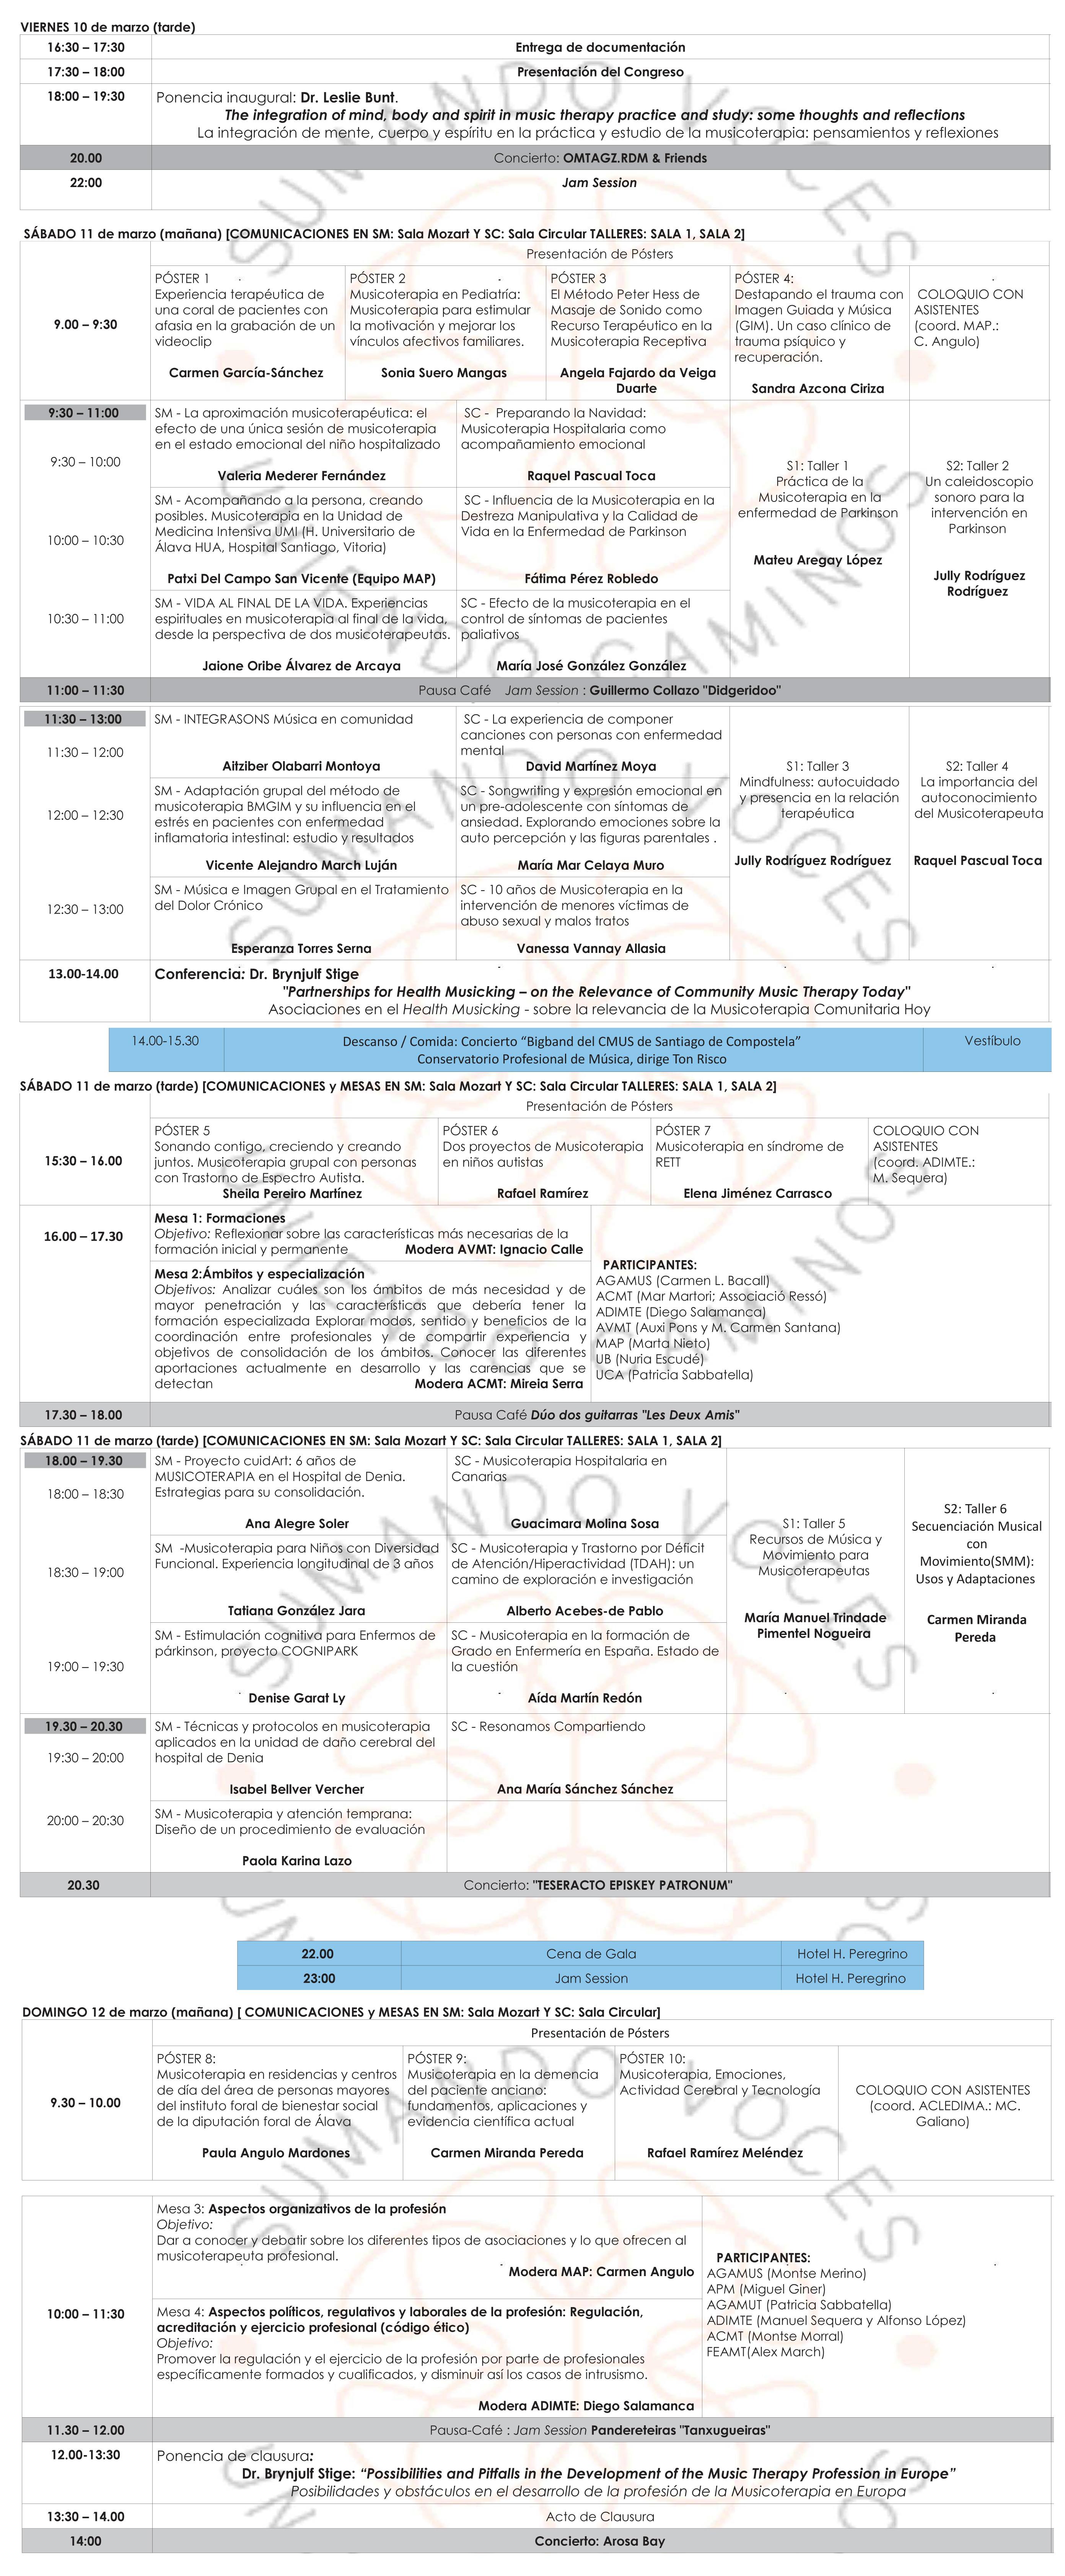 geriatricarea Congreso Nacional de Musicoterapia